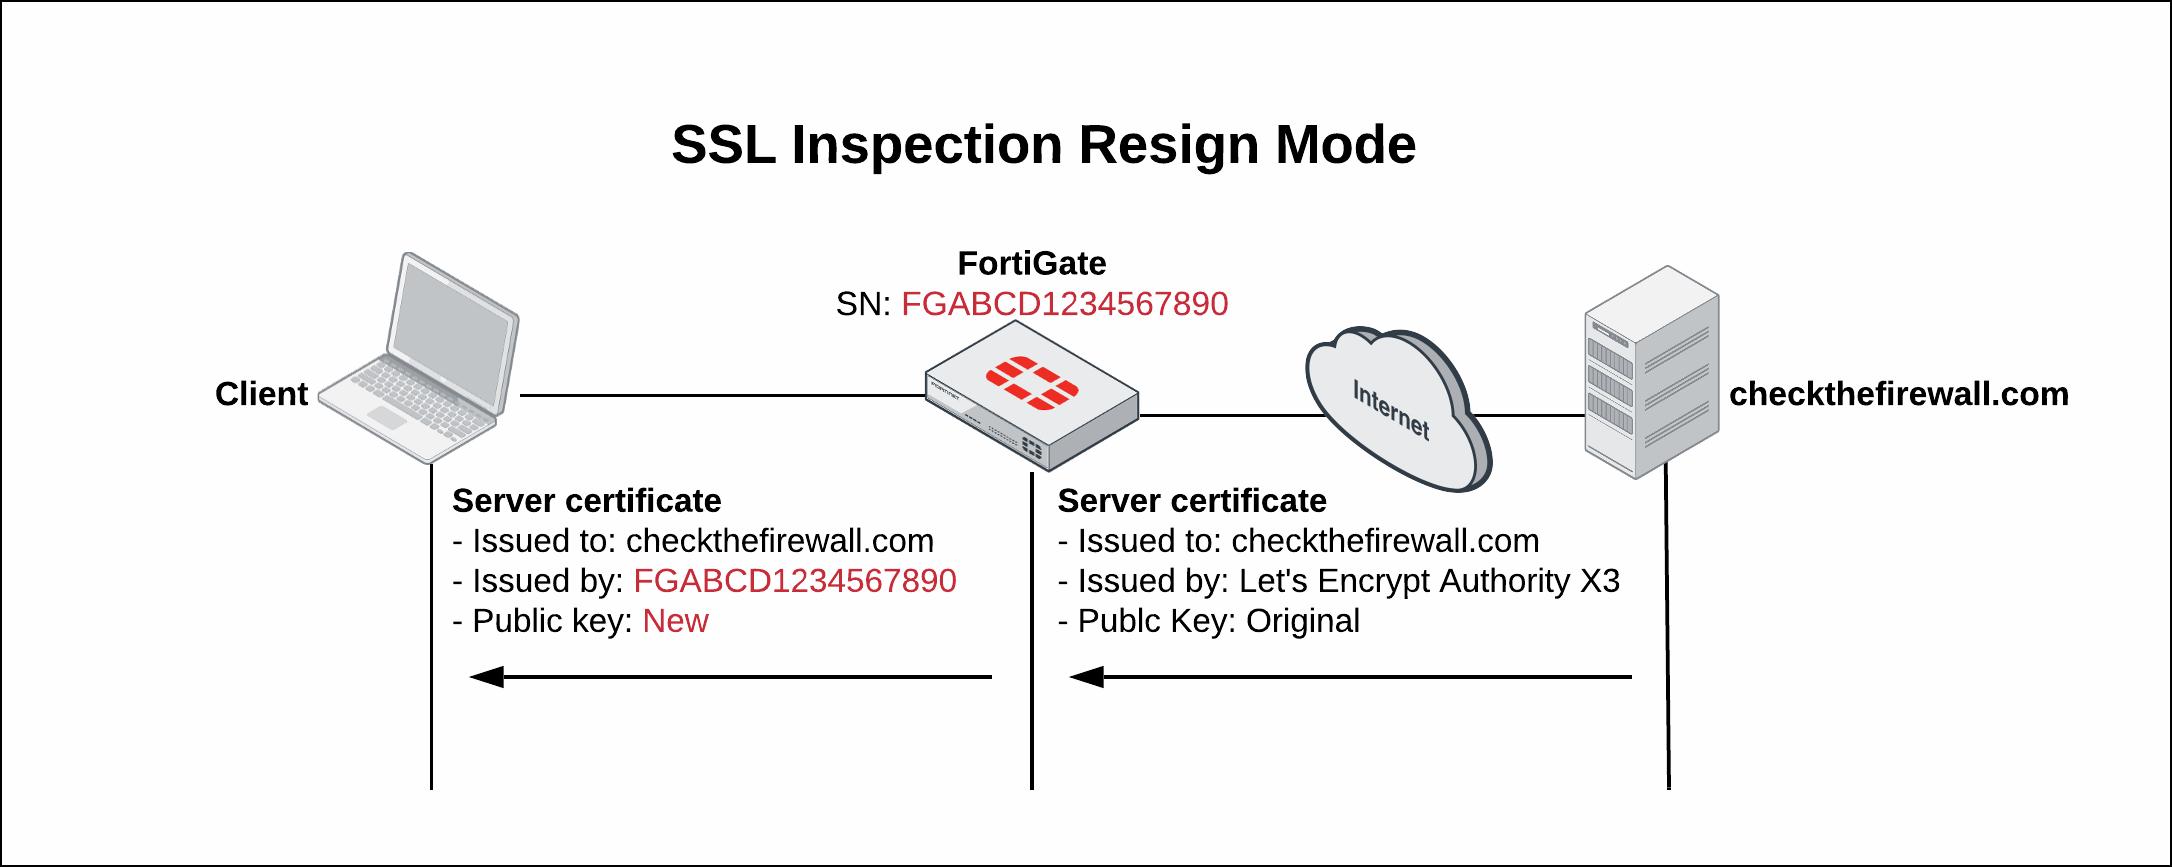 SSL Inspection Resign Mode